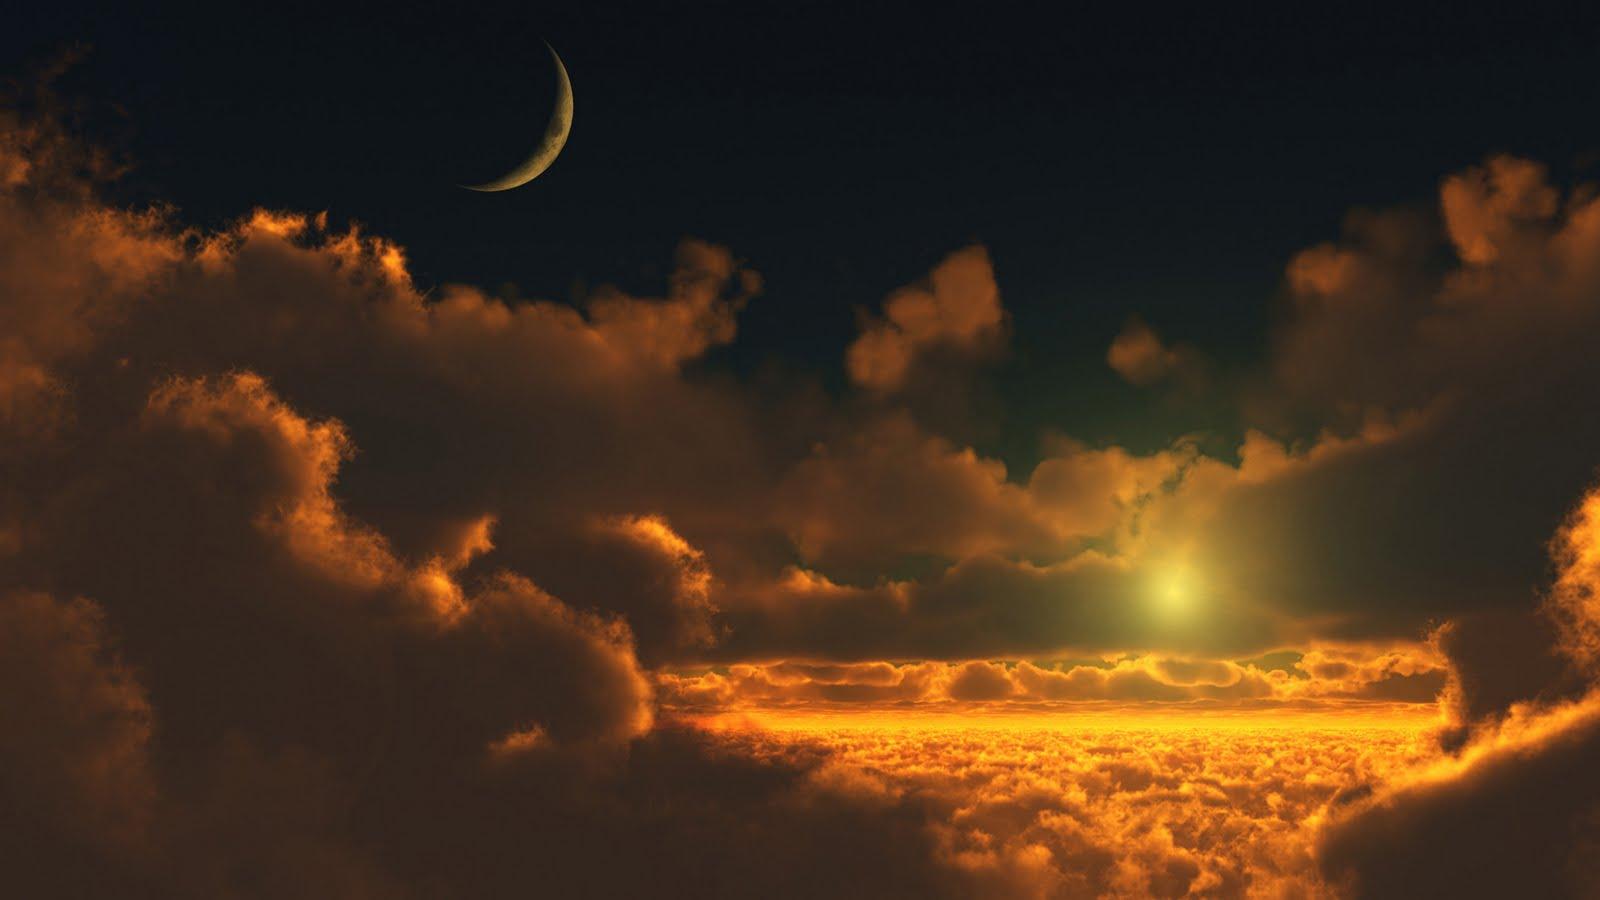 http://3.bp.blogspot.com/_9edIyCi5GyQ/TUx5dsEK2DI/AAAAAAAAAB0/wTOHa57cHAc/s1600/clouds-at-sunset-wallpaper.jpg